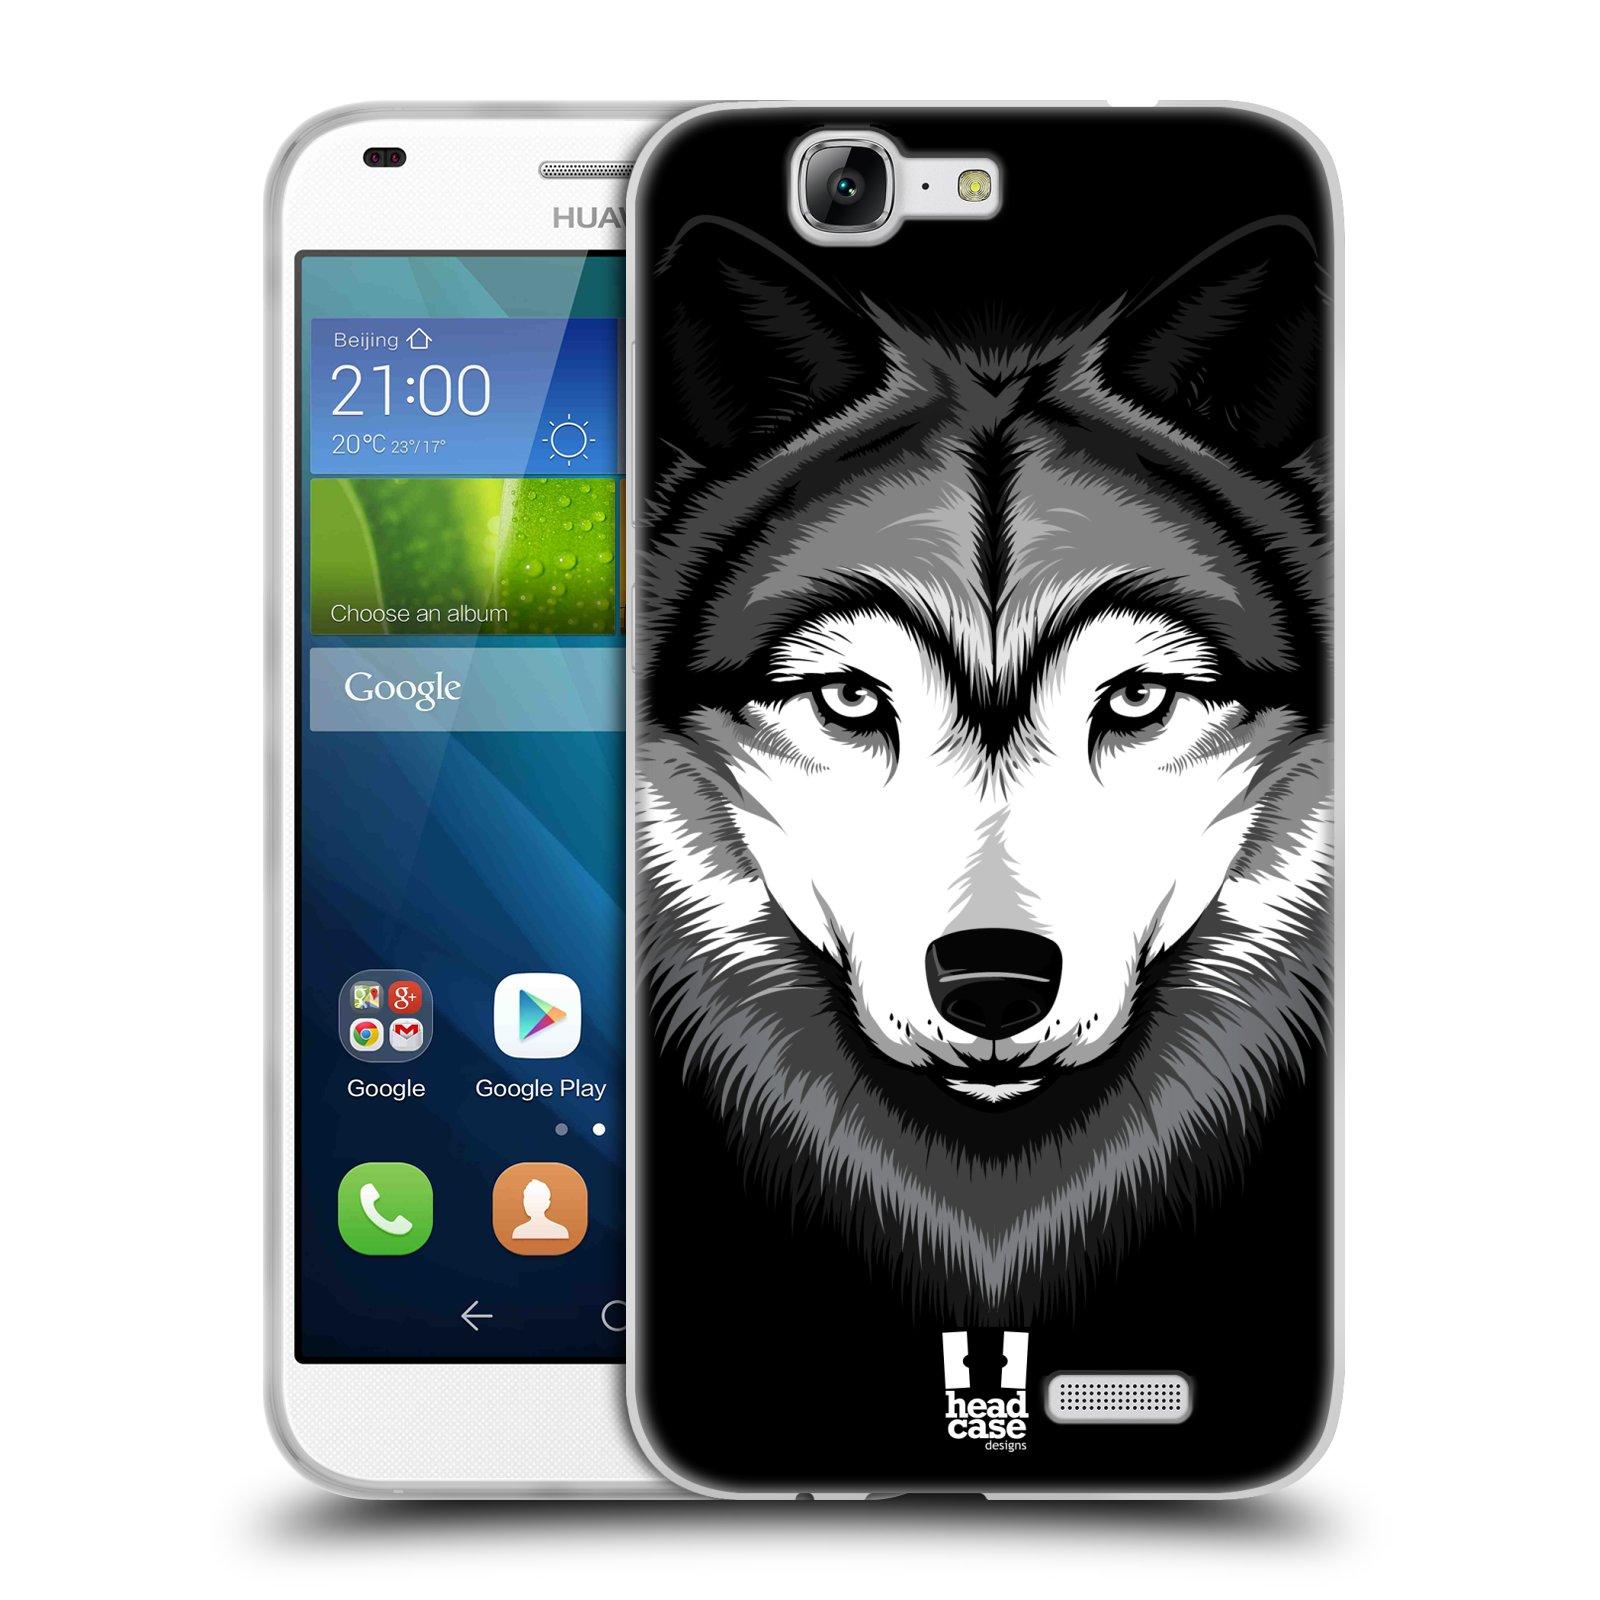 Silikonové pouzdro na mobil Huawei Ascend G7 HEAD CASE ILUSTROVANÝ VLK